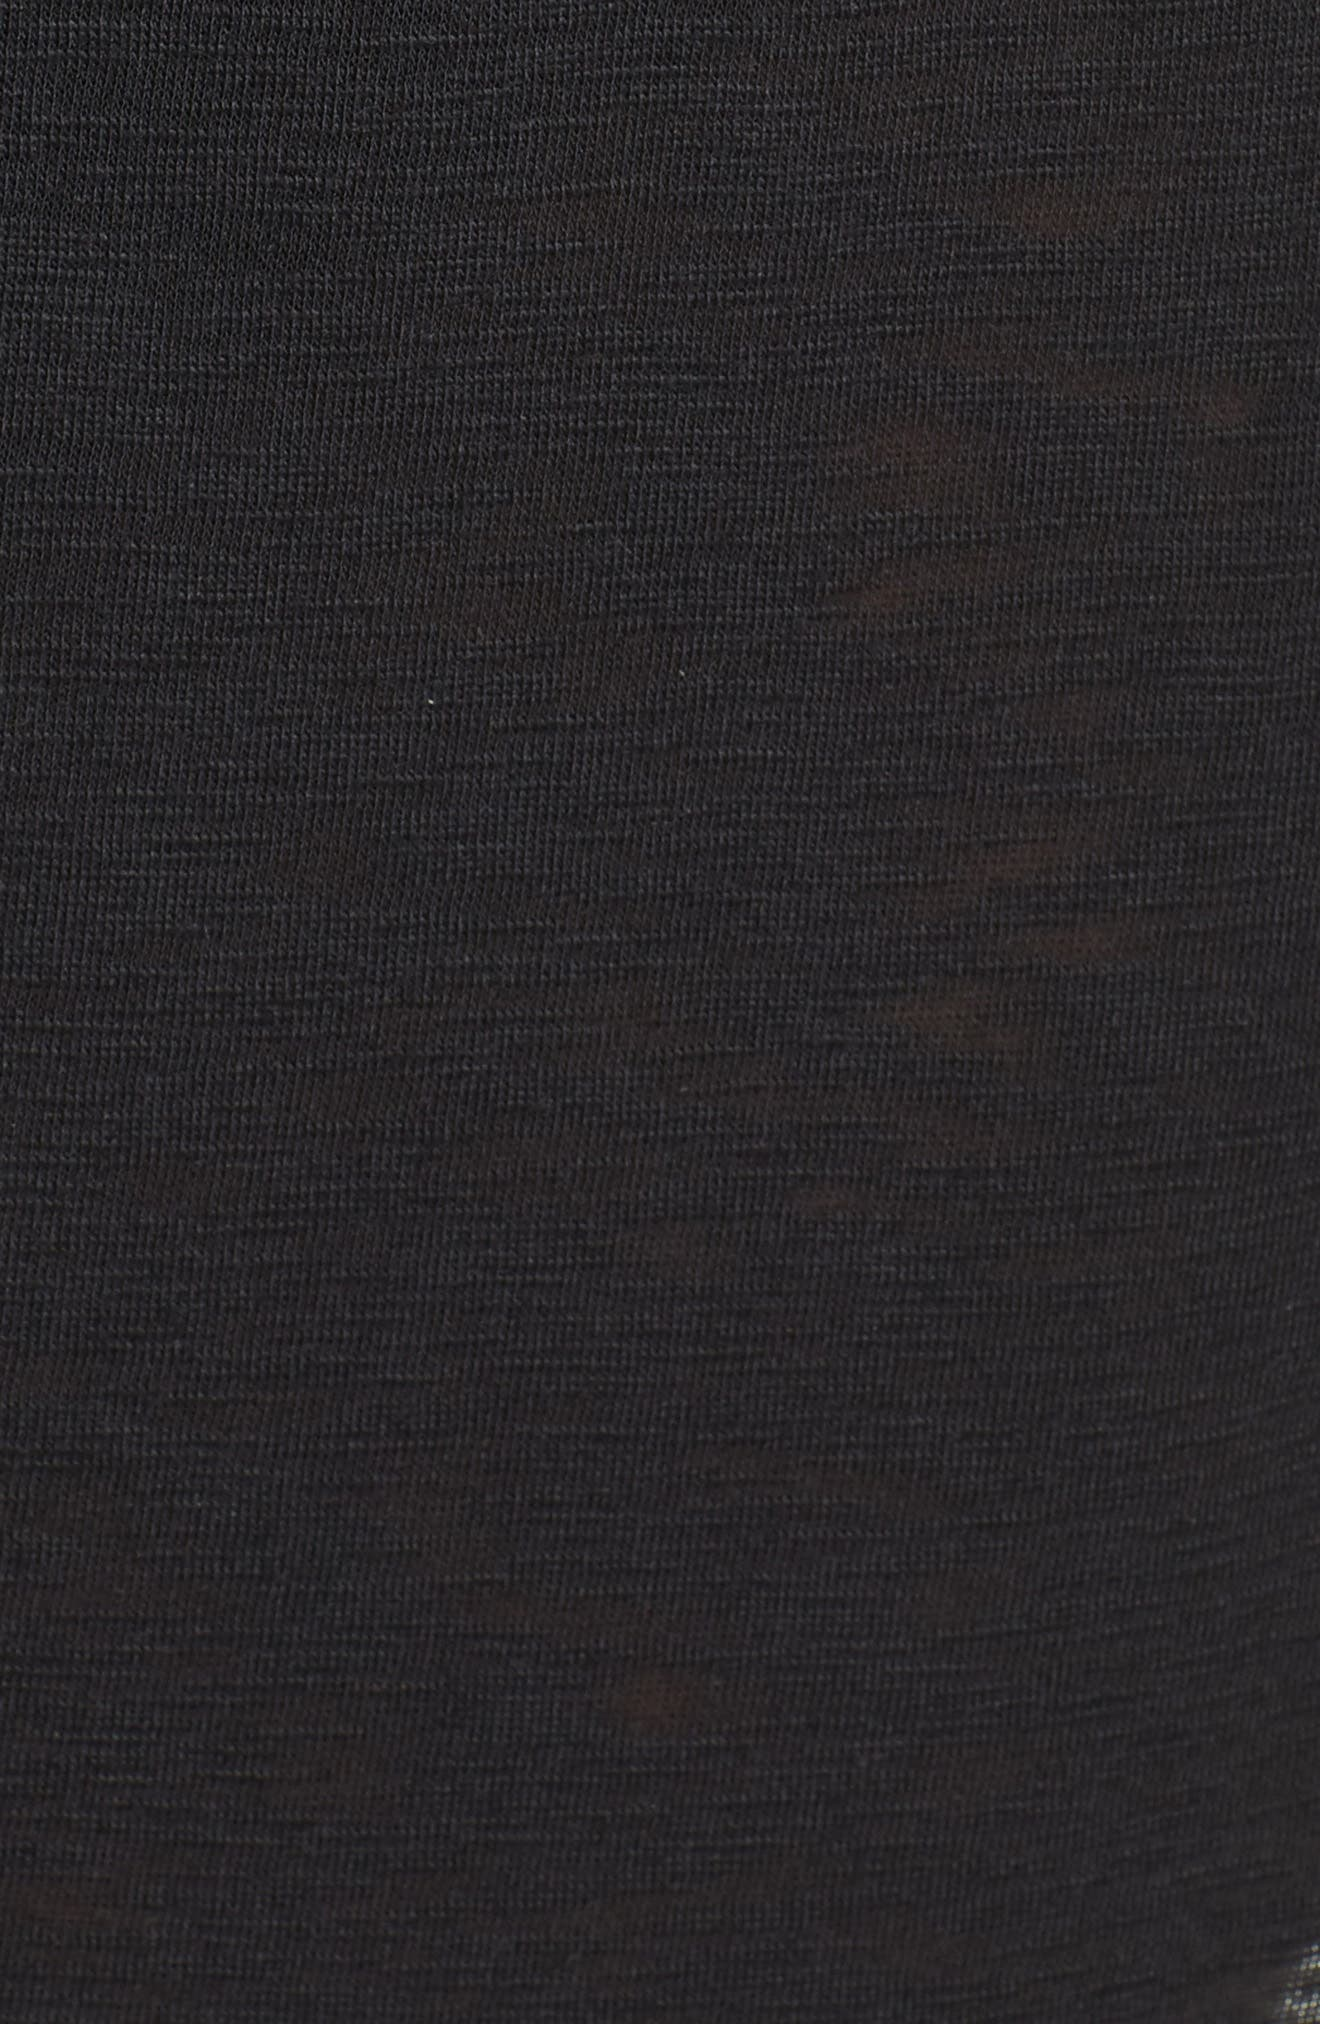 TOMMY BAHAMA,                             Cover-Up Skirt,                             Alternate thumbnail 5, color,                             BLACK